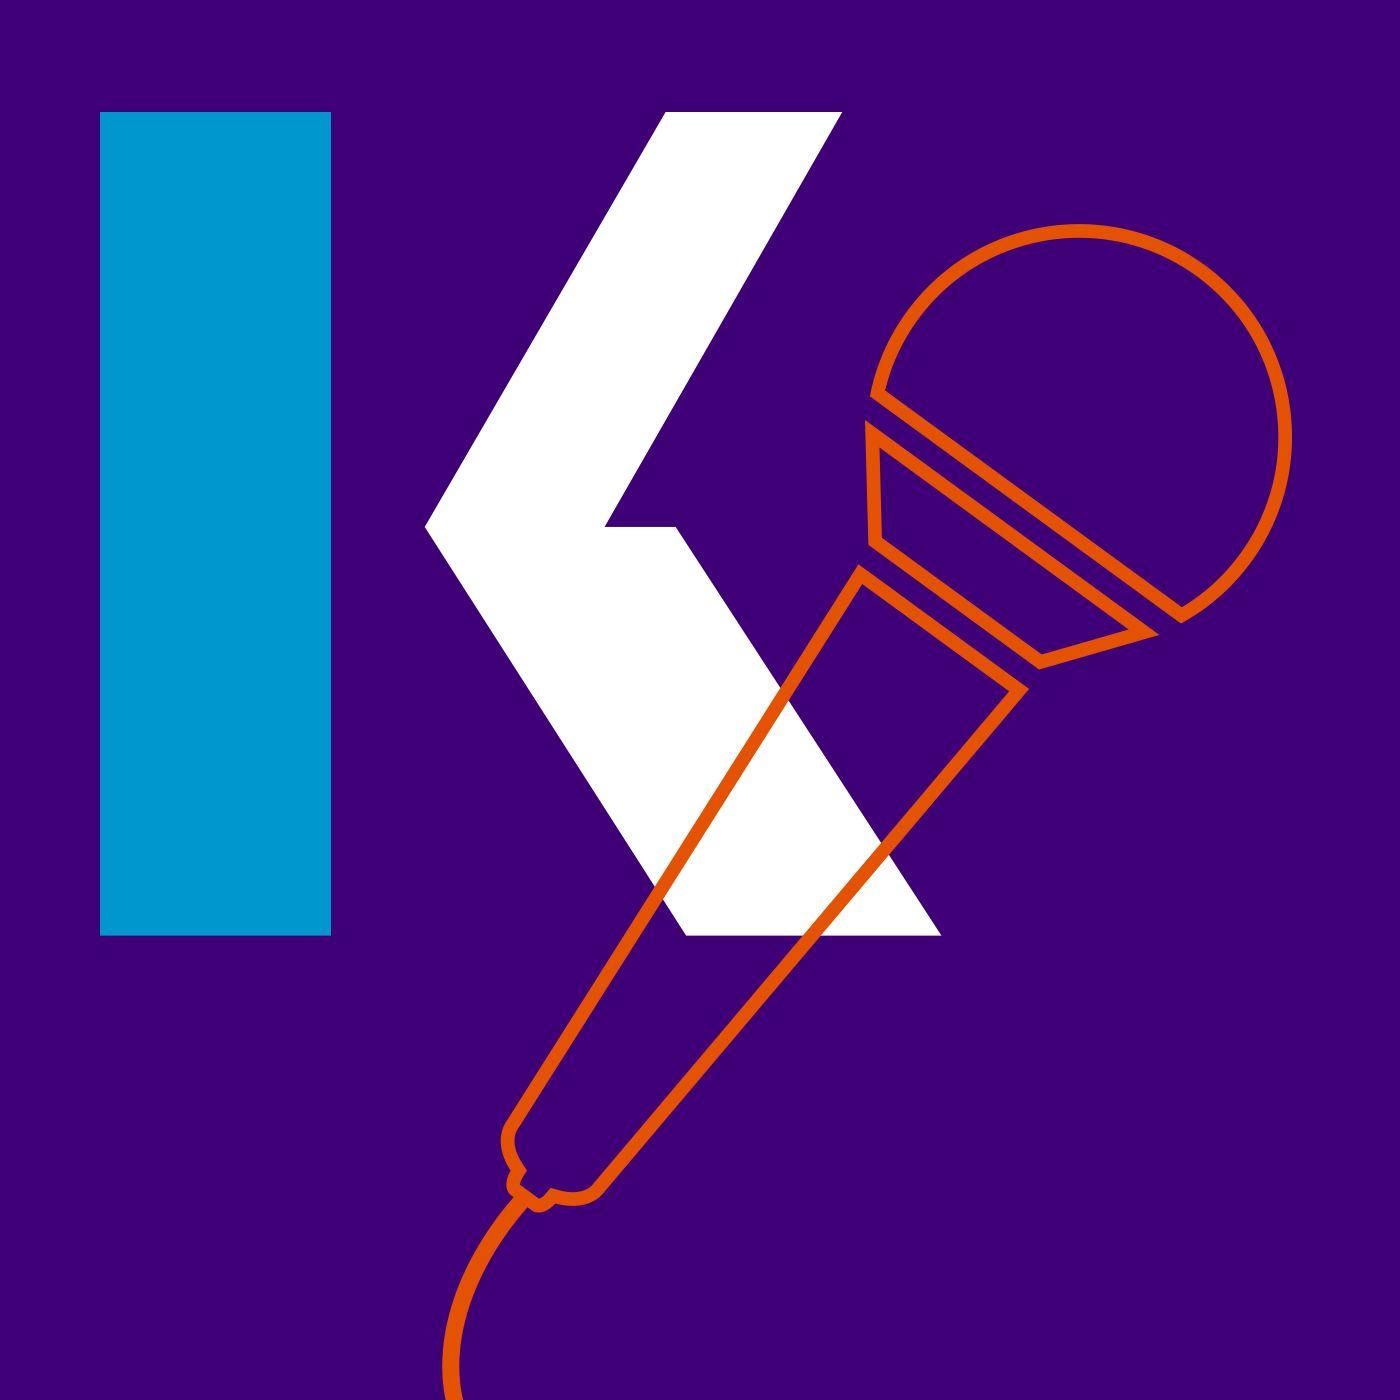 Kaplan's NCLEX Prepcast - Episode 19 - Getting Your Masters in Nursing or DNP